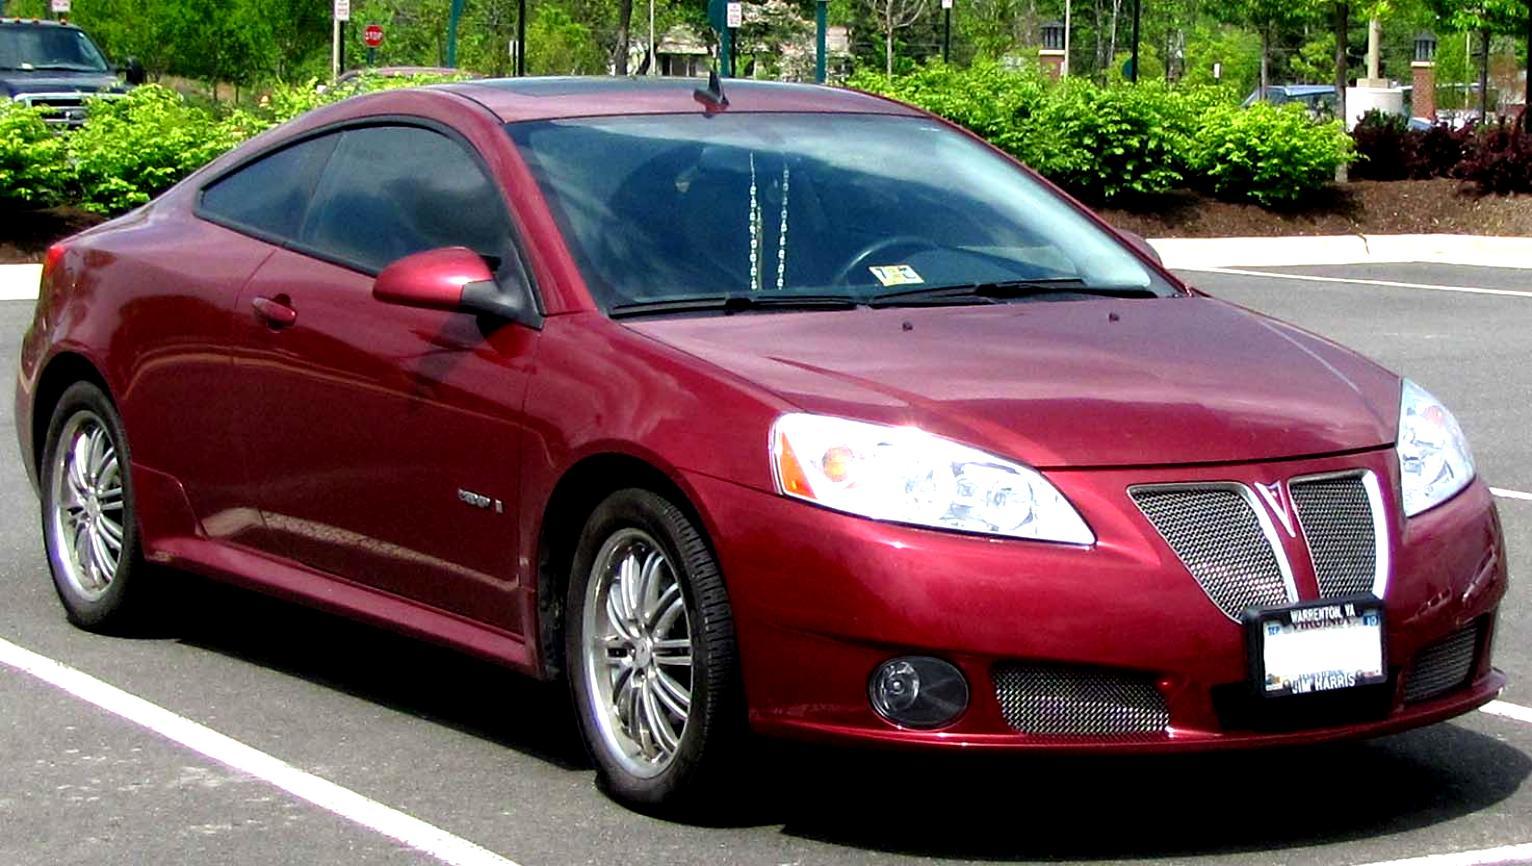 Pontiac G6 Convertible 2008 On Motoimg Com